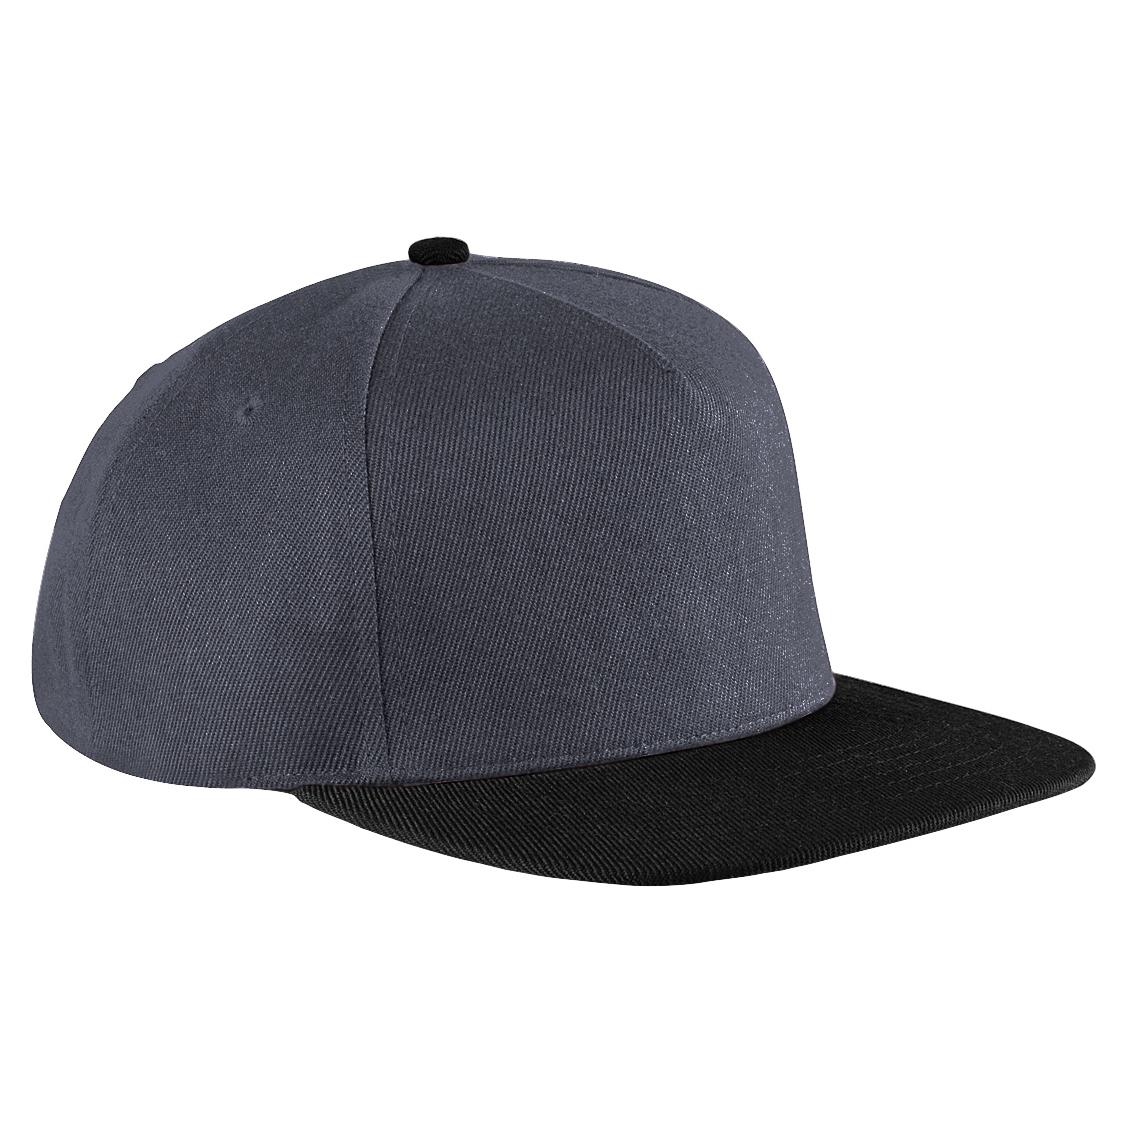 beechfield unisex original retro flat peak snapback hat